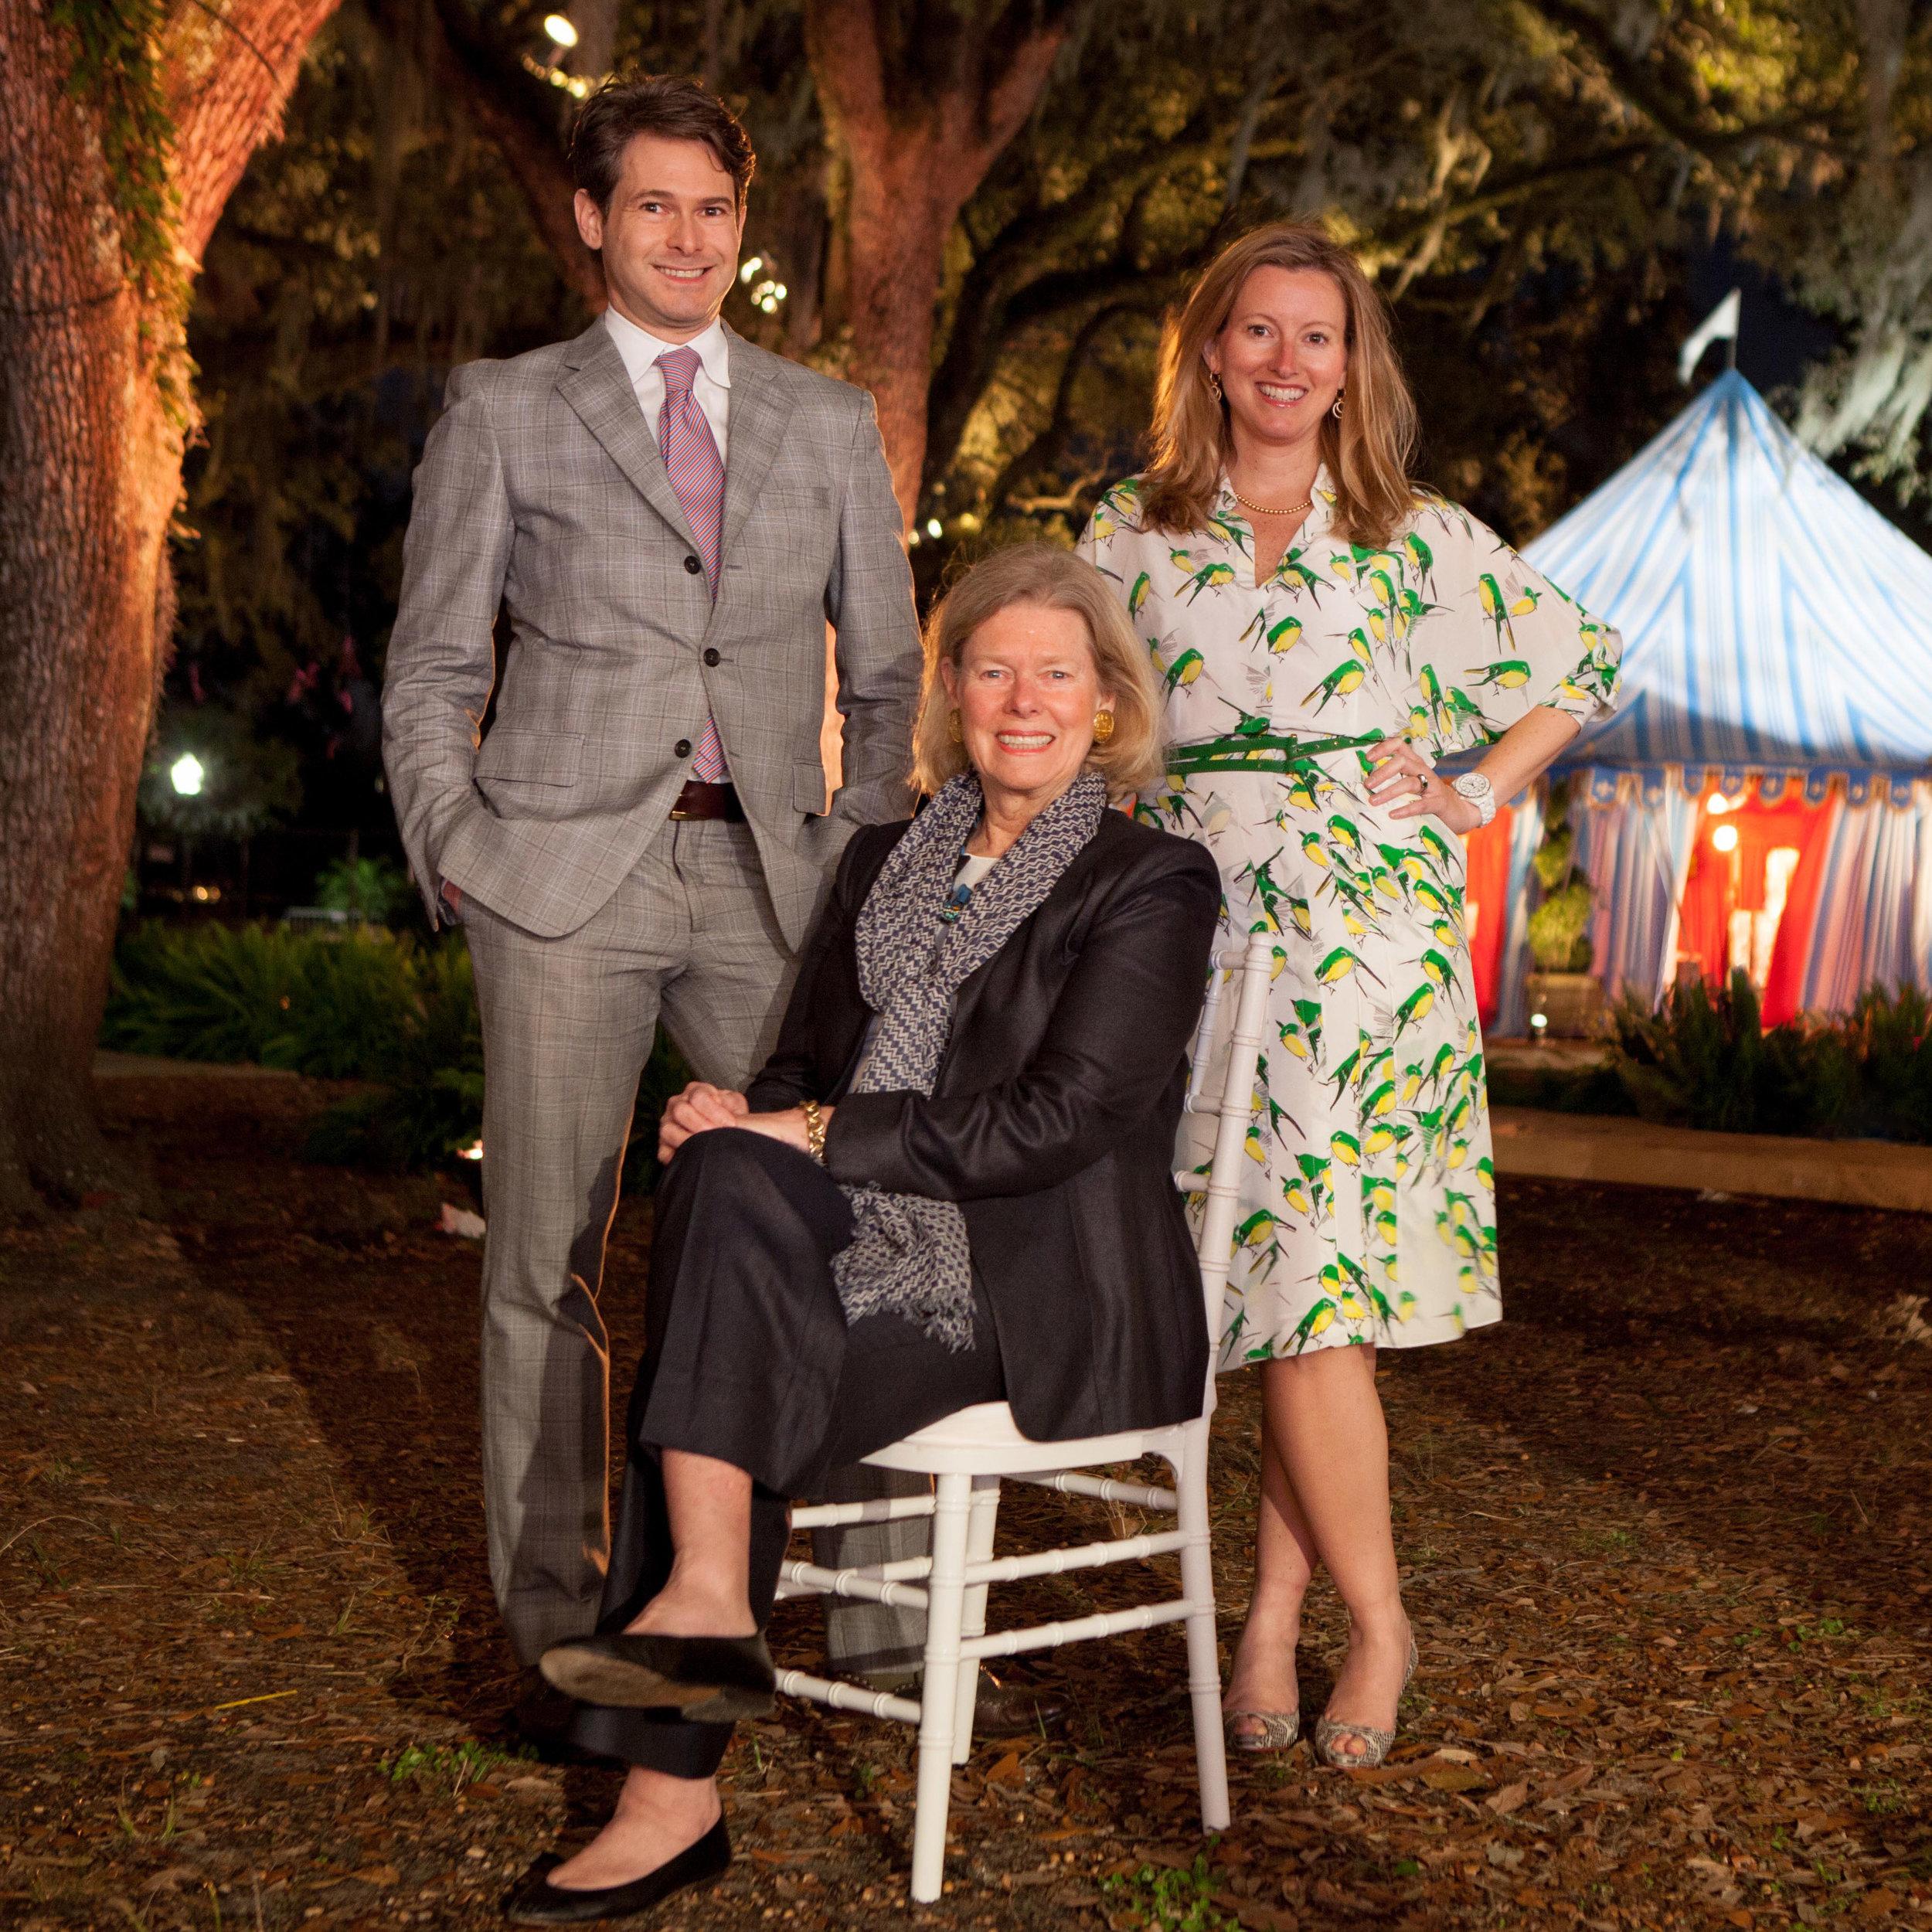 Van Wyck Family Photo 2013.jpg